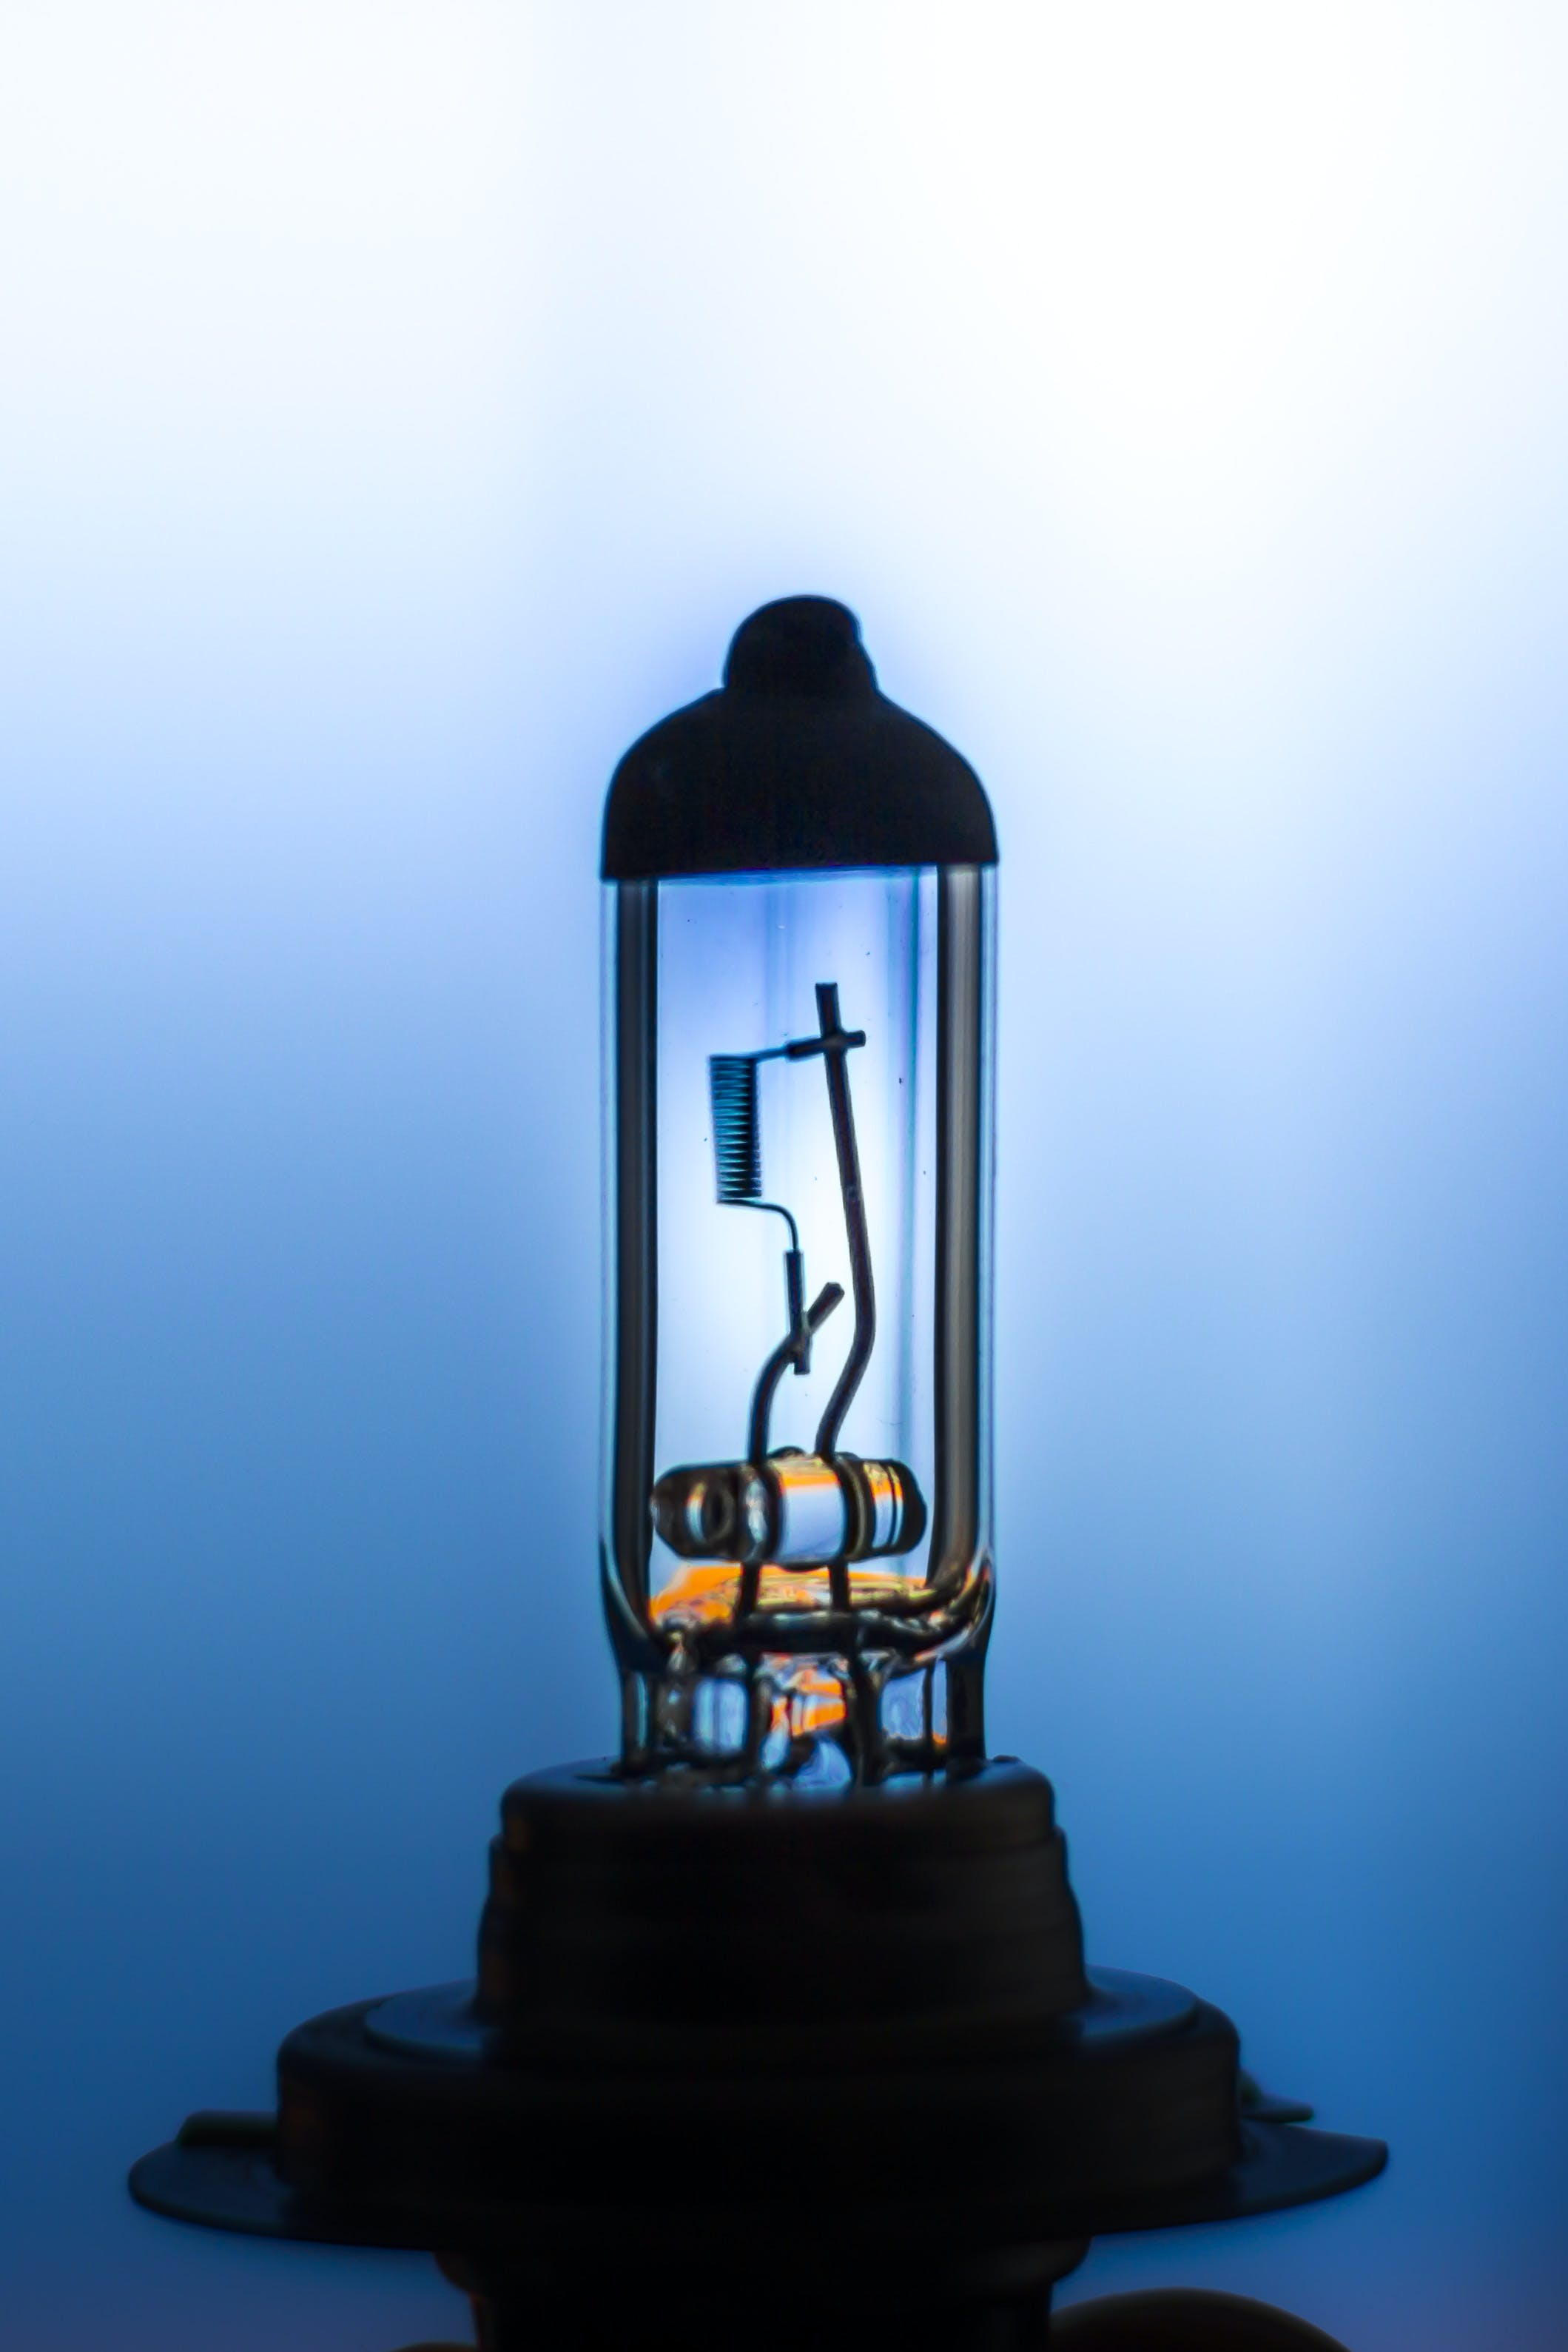 lamp, physics, technic